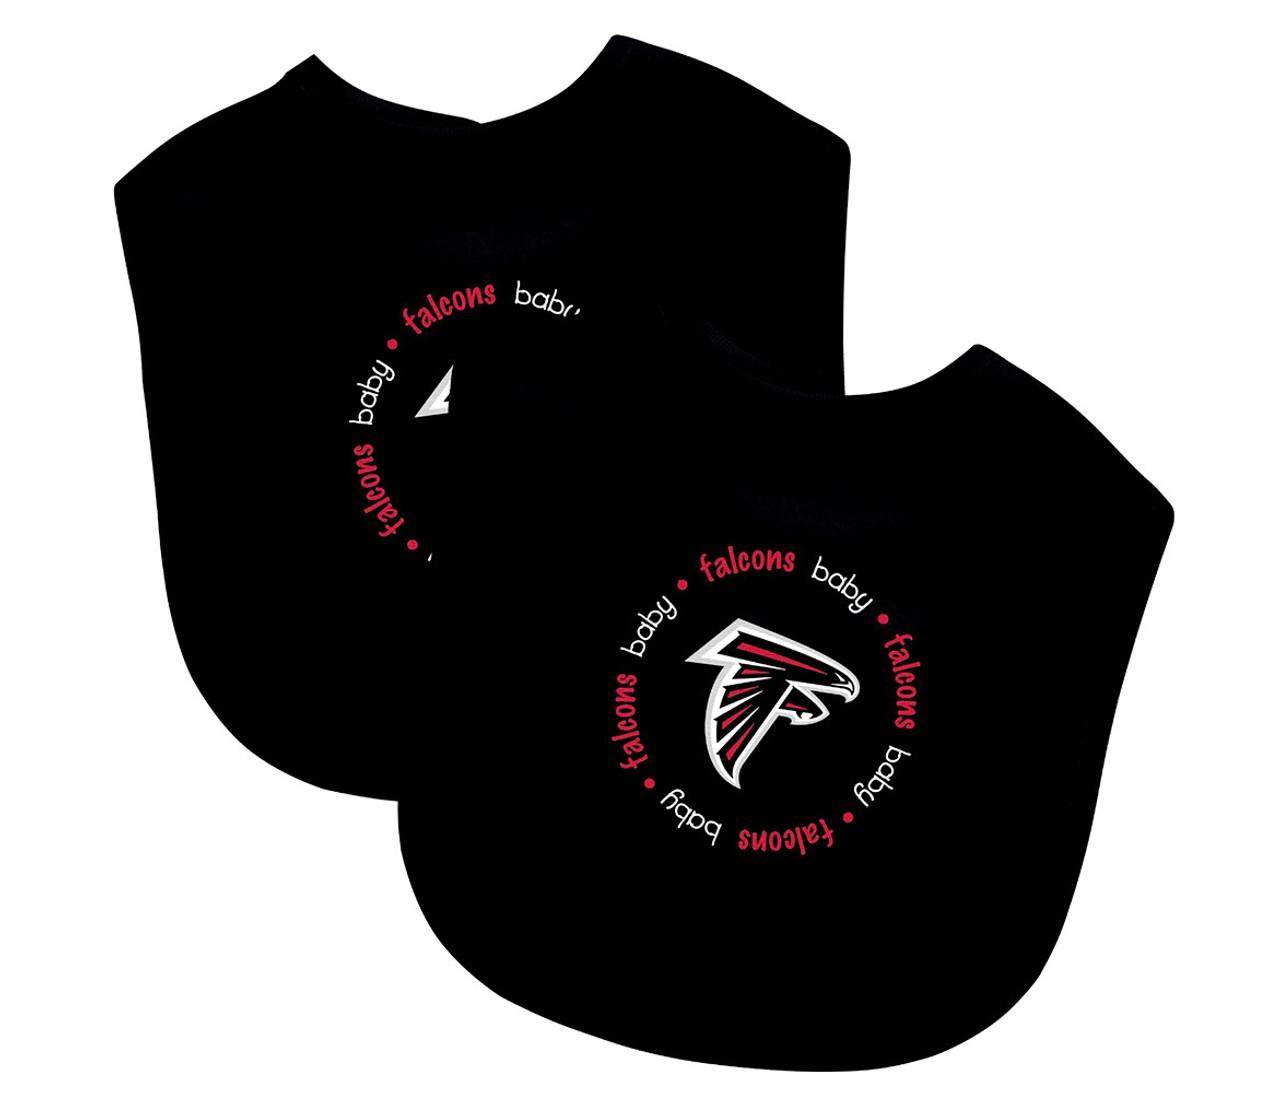 promo code 38421 c7f0a Toddler Sports Accessories Baby Fanatic Atlanta Falcons Feeding Bibs (2pc  Set)